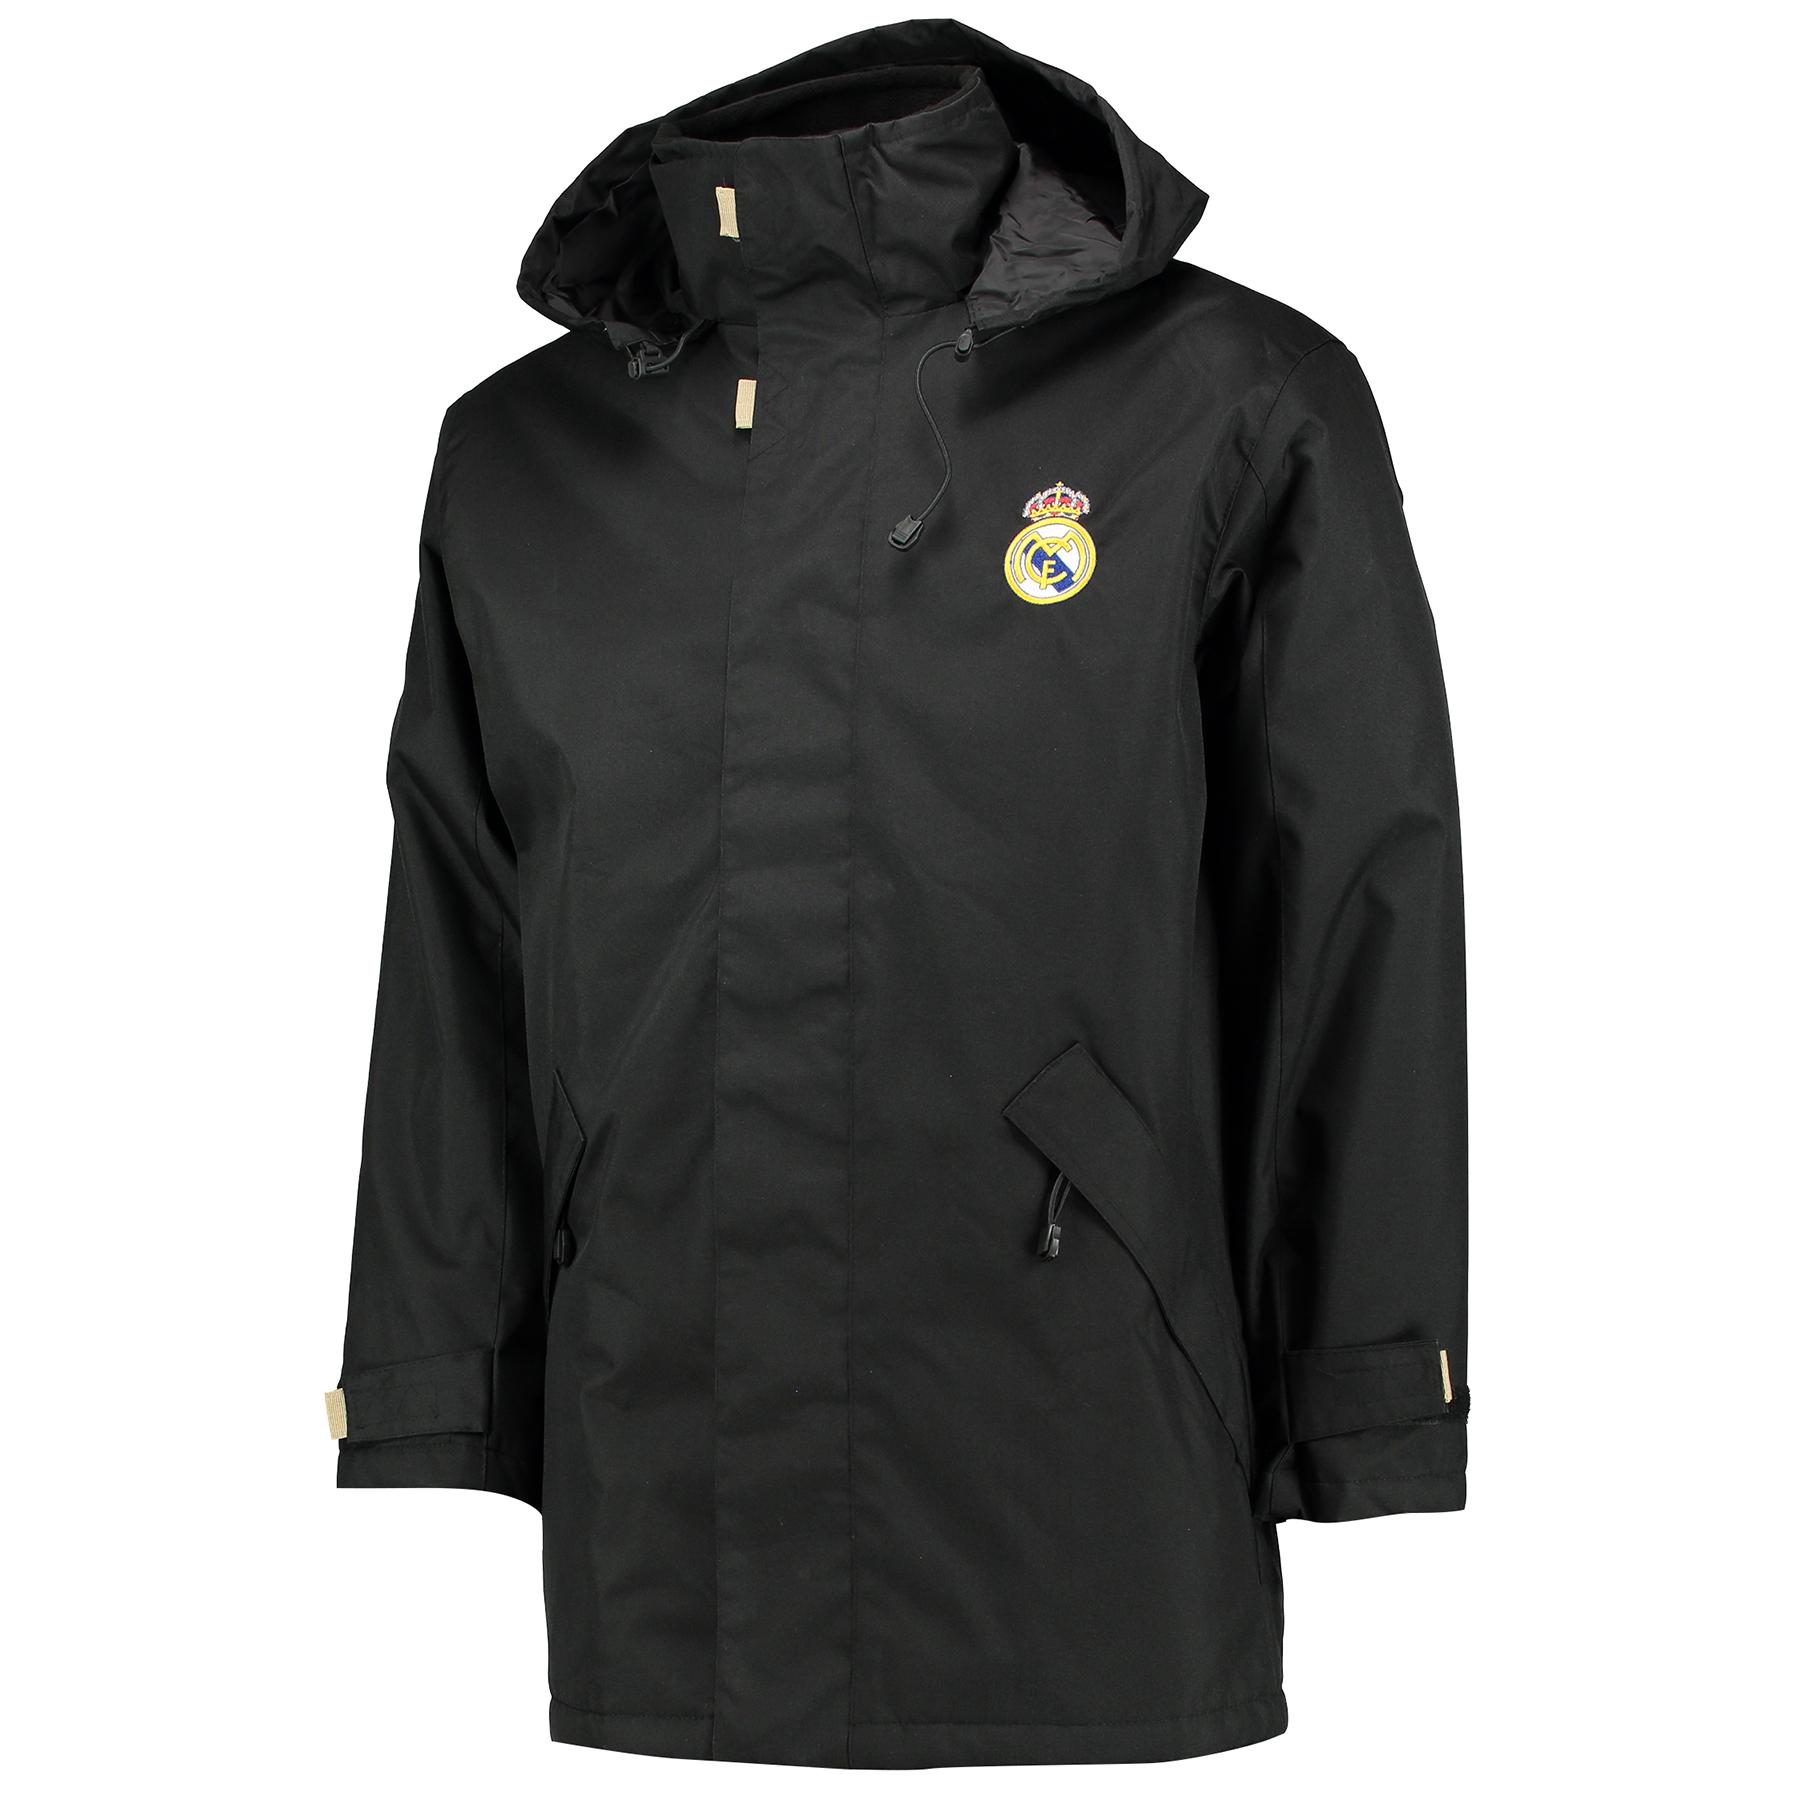 Real Madrid UEFA Champions League Heavy Weight Jacket - Black - Mens